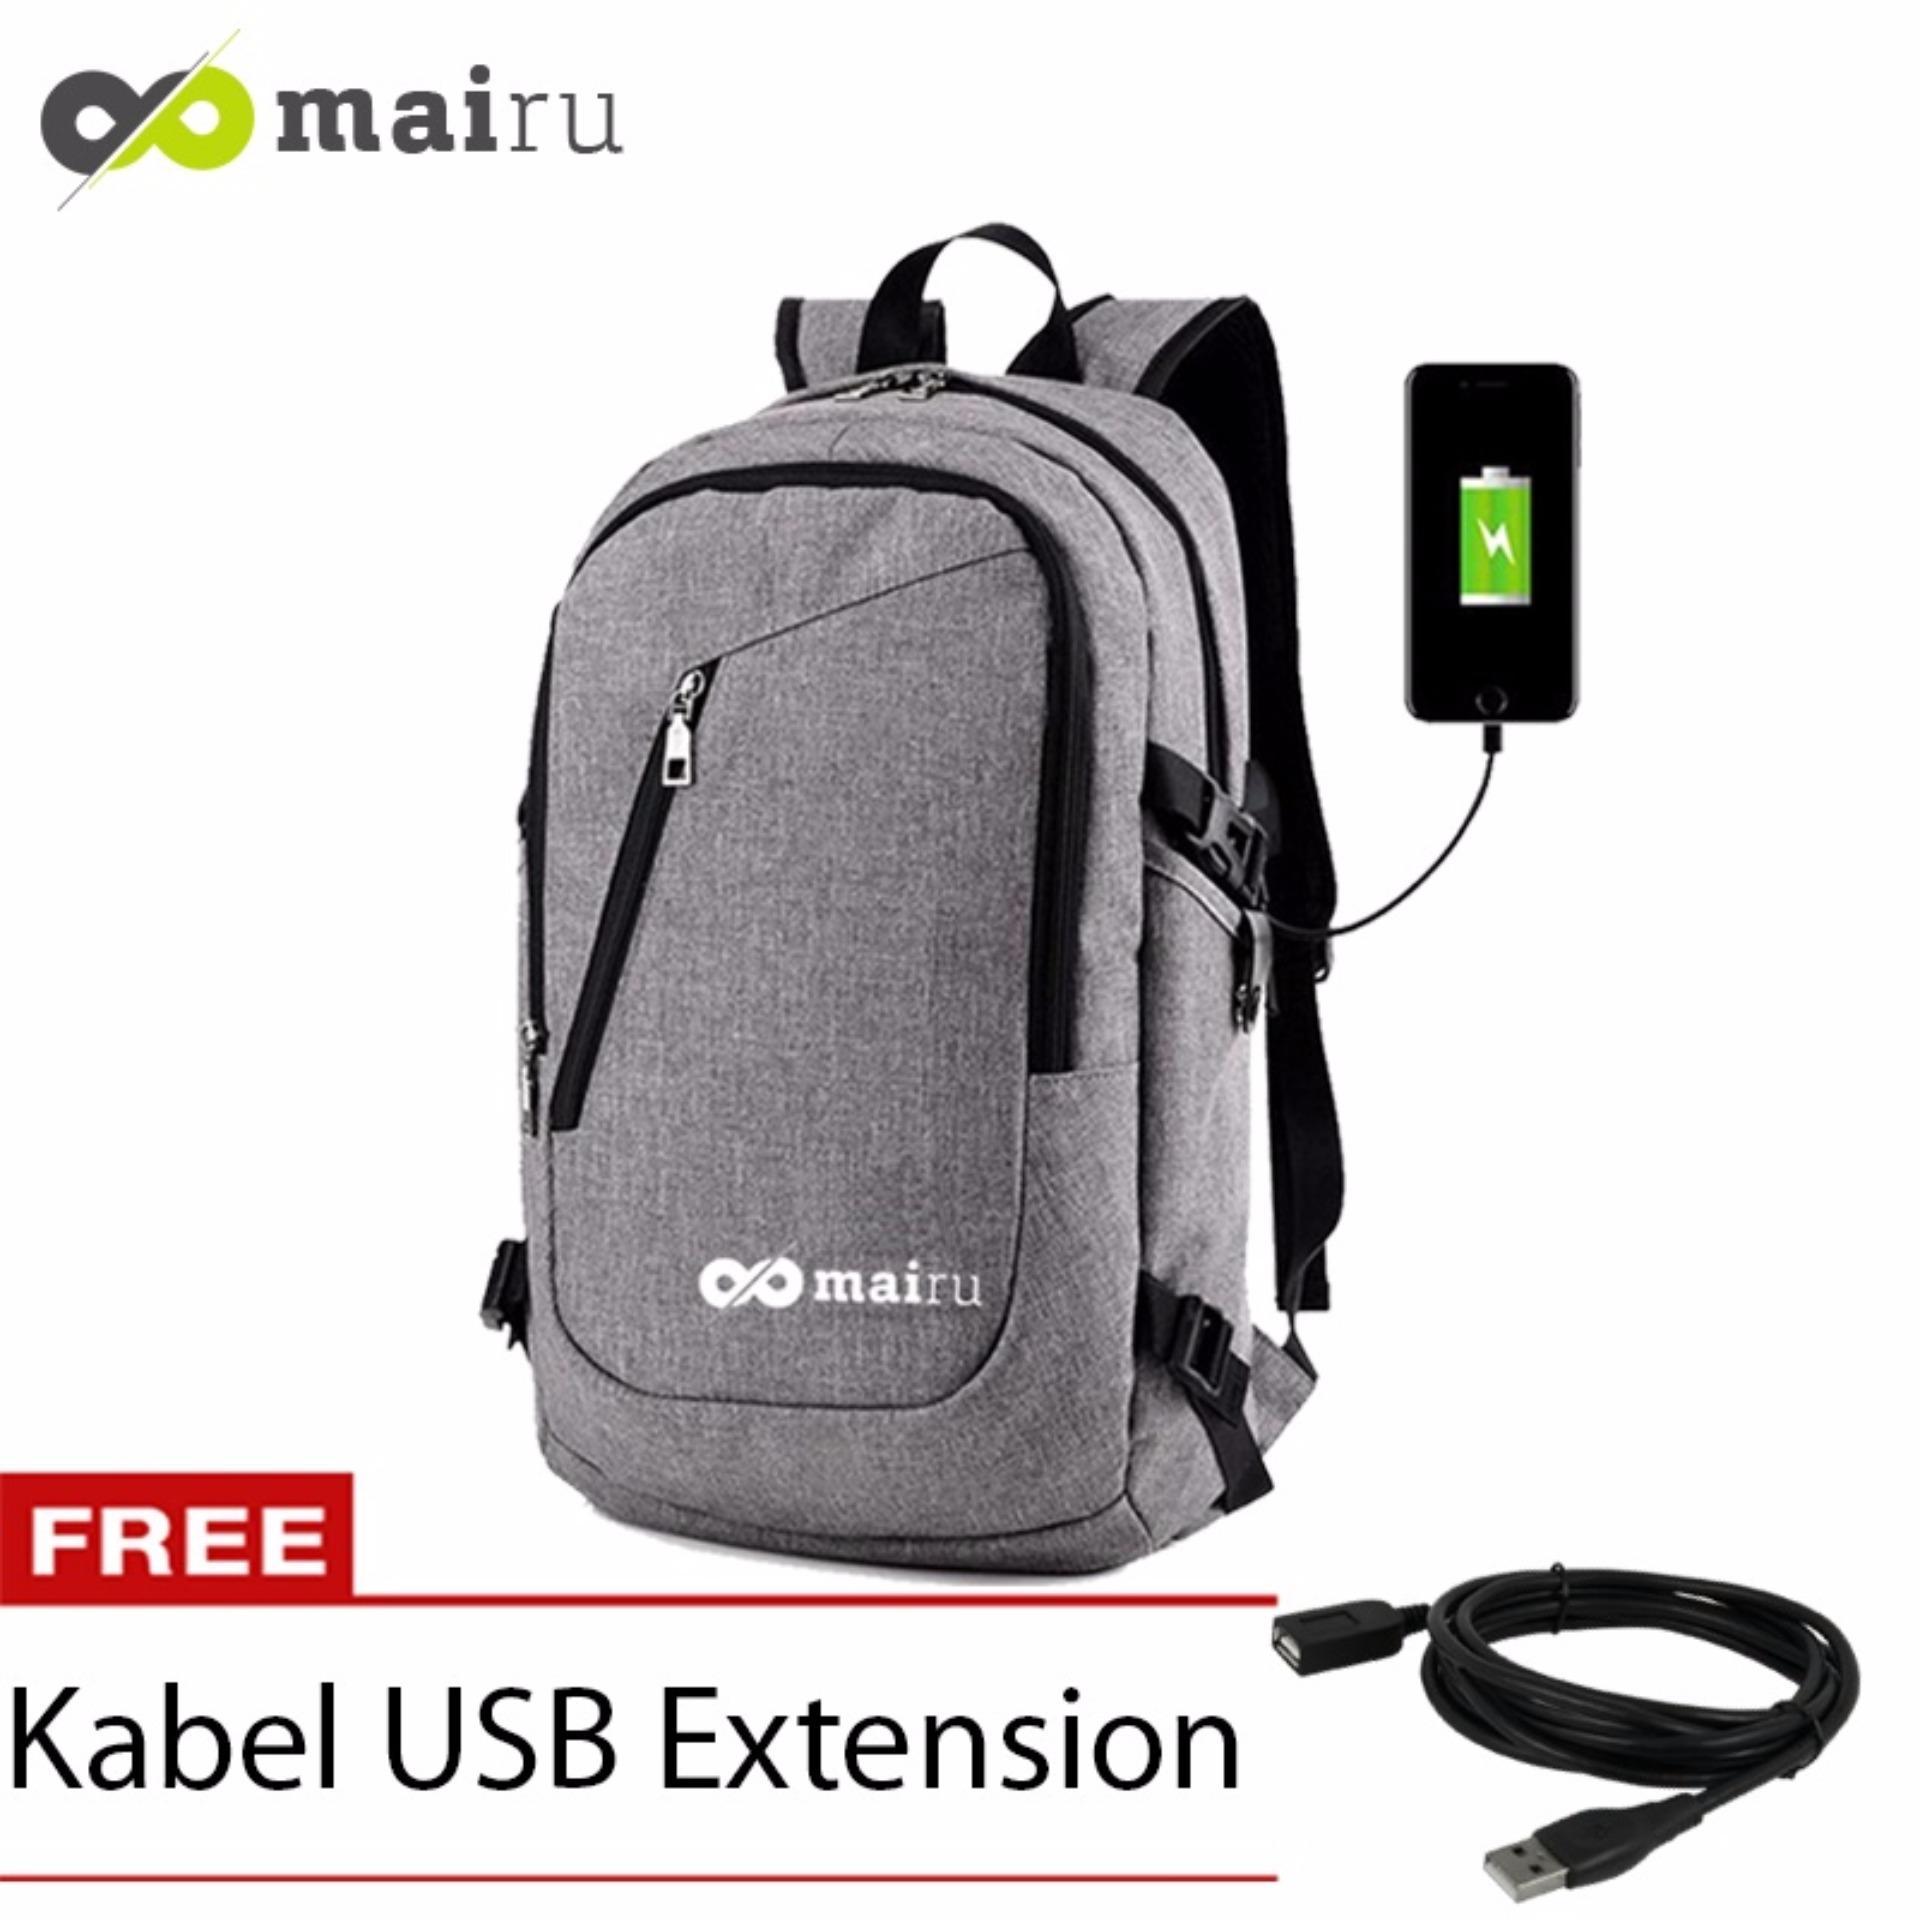 Ulasan Mengenai Mairu Tas Ransel Laptop Pria Sekolah Kuliah Kerja Backpack Support Usb Port Charger Anti Air 0219 Grey